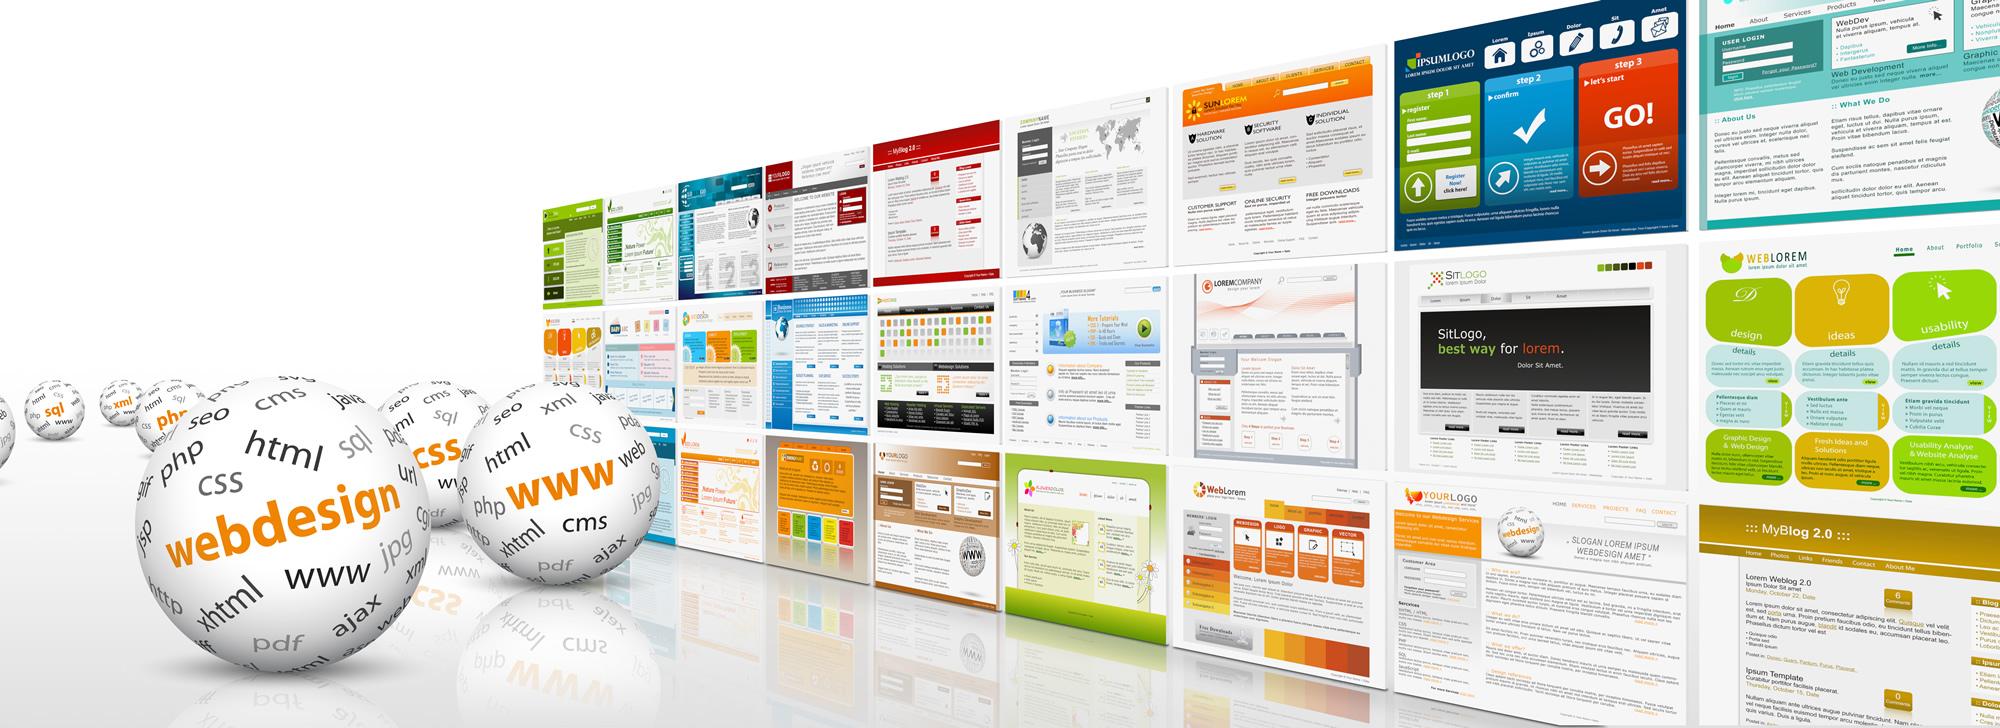 MD WEB Design